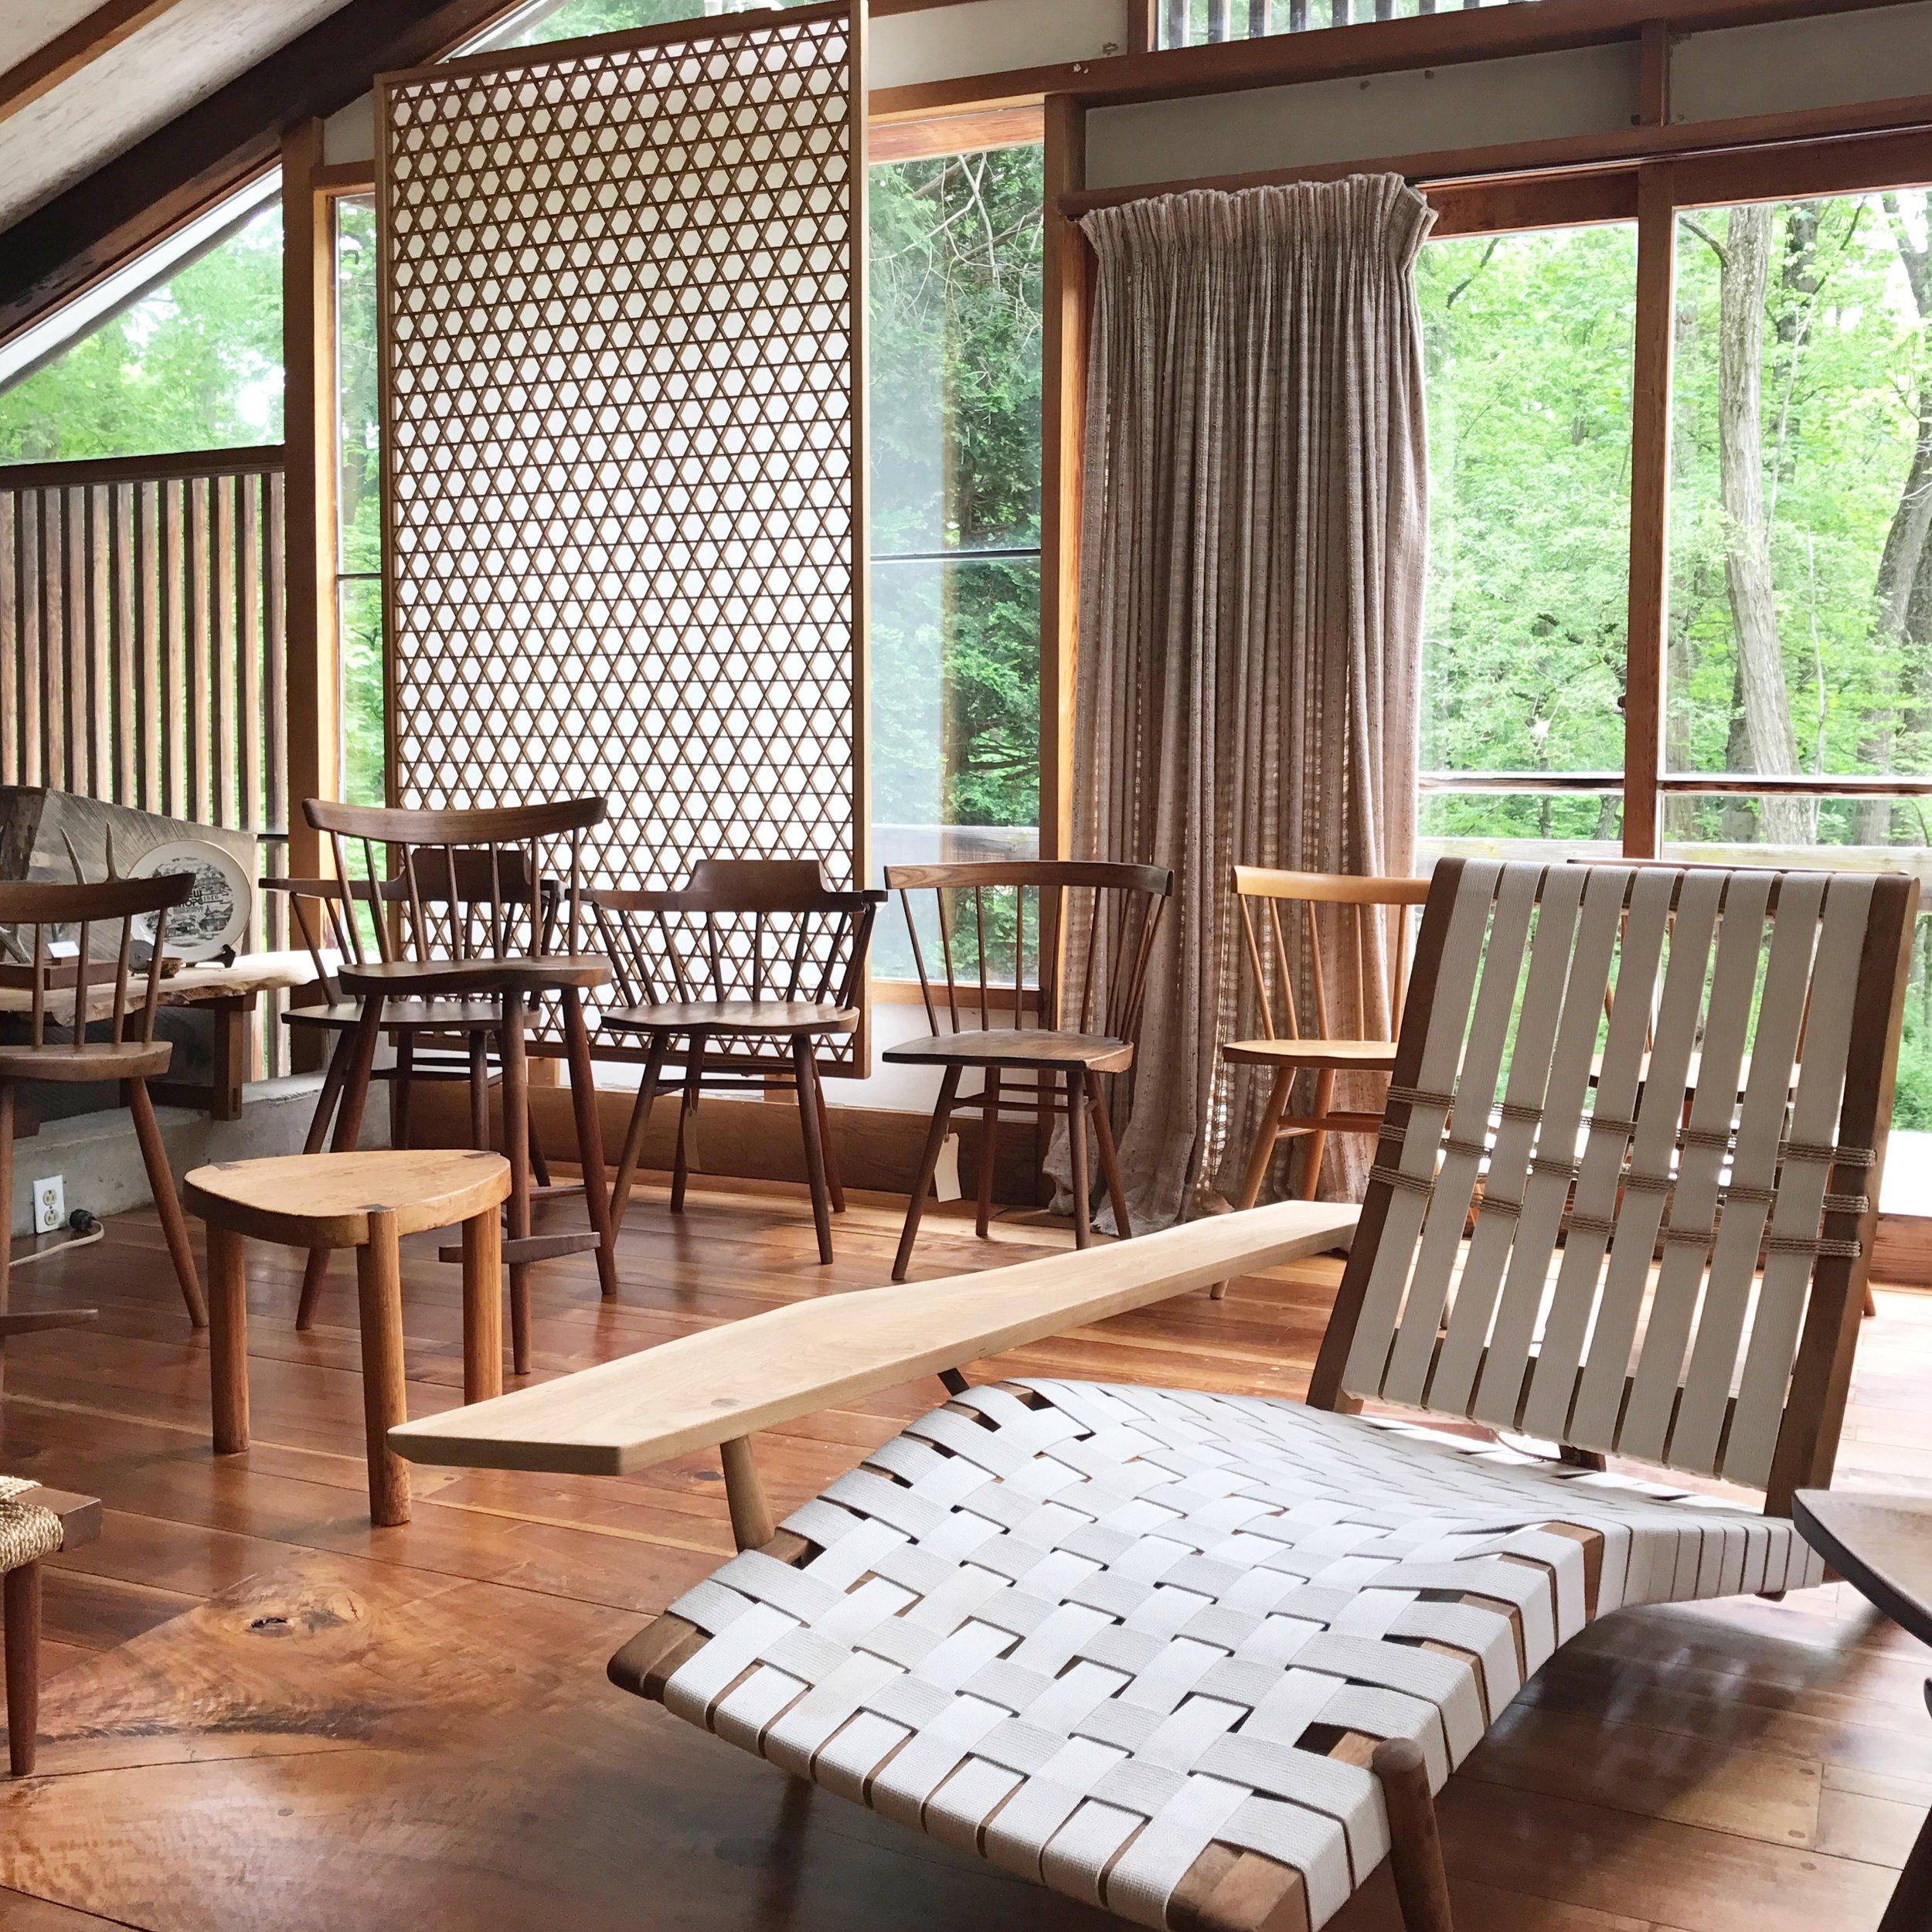 A collection of Nakashima furniture